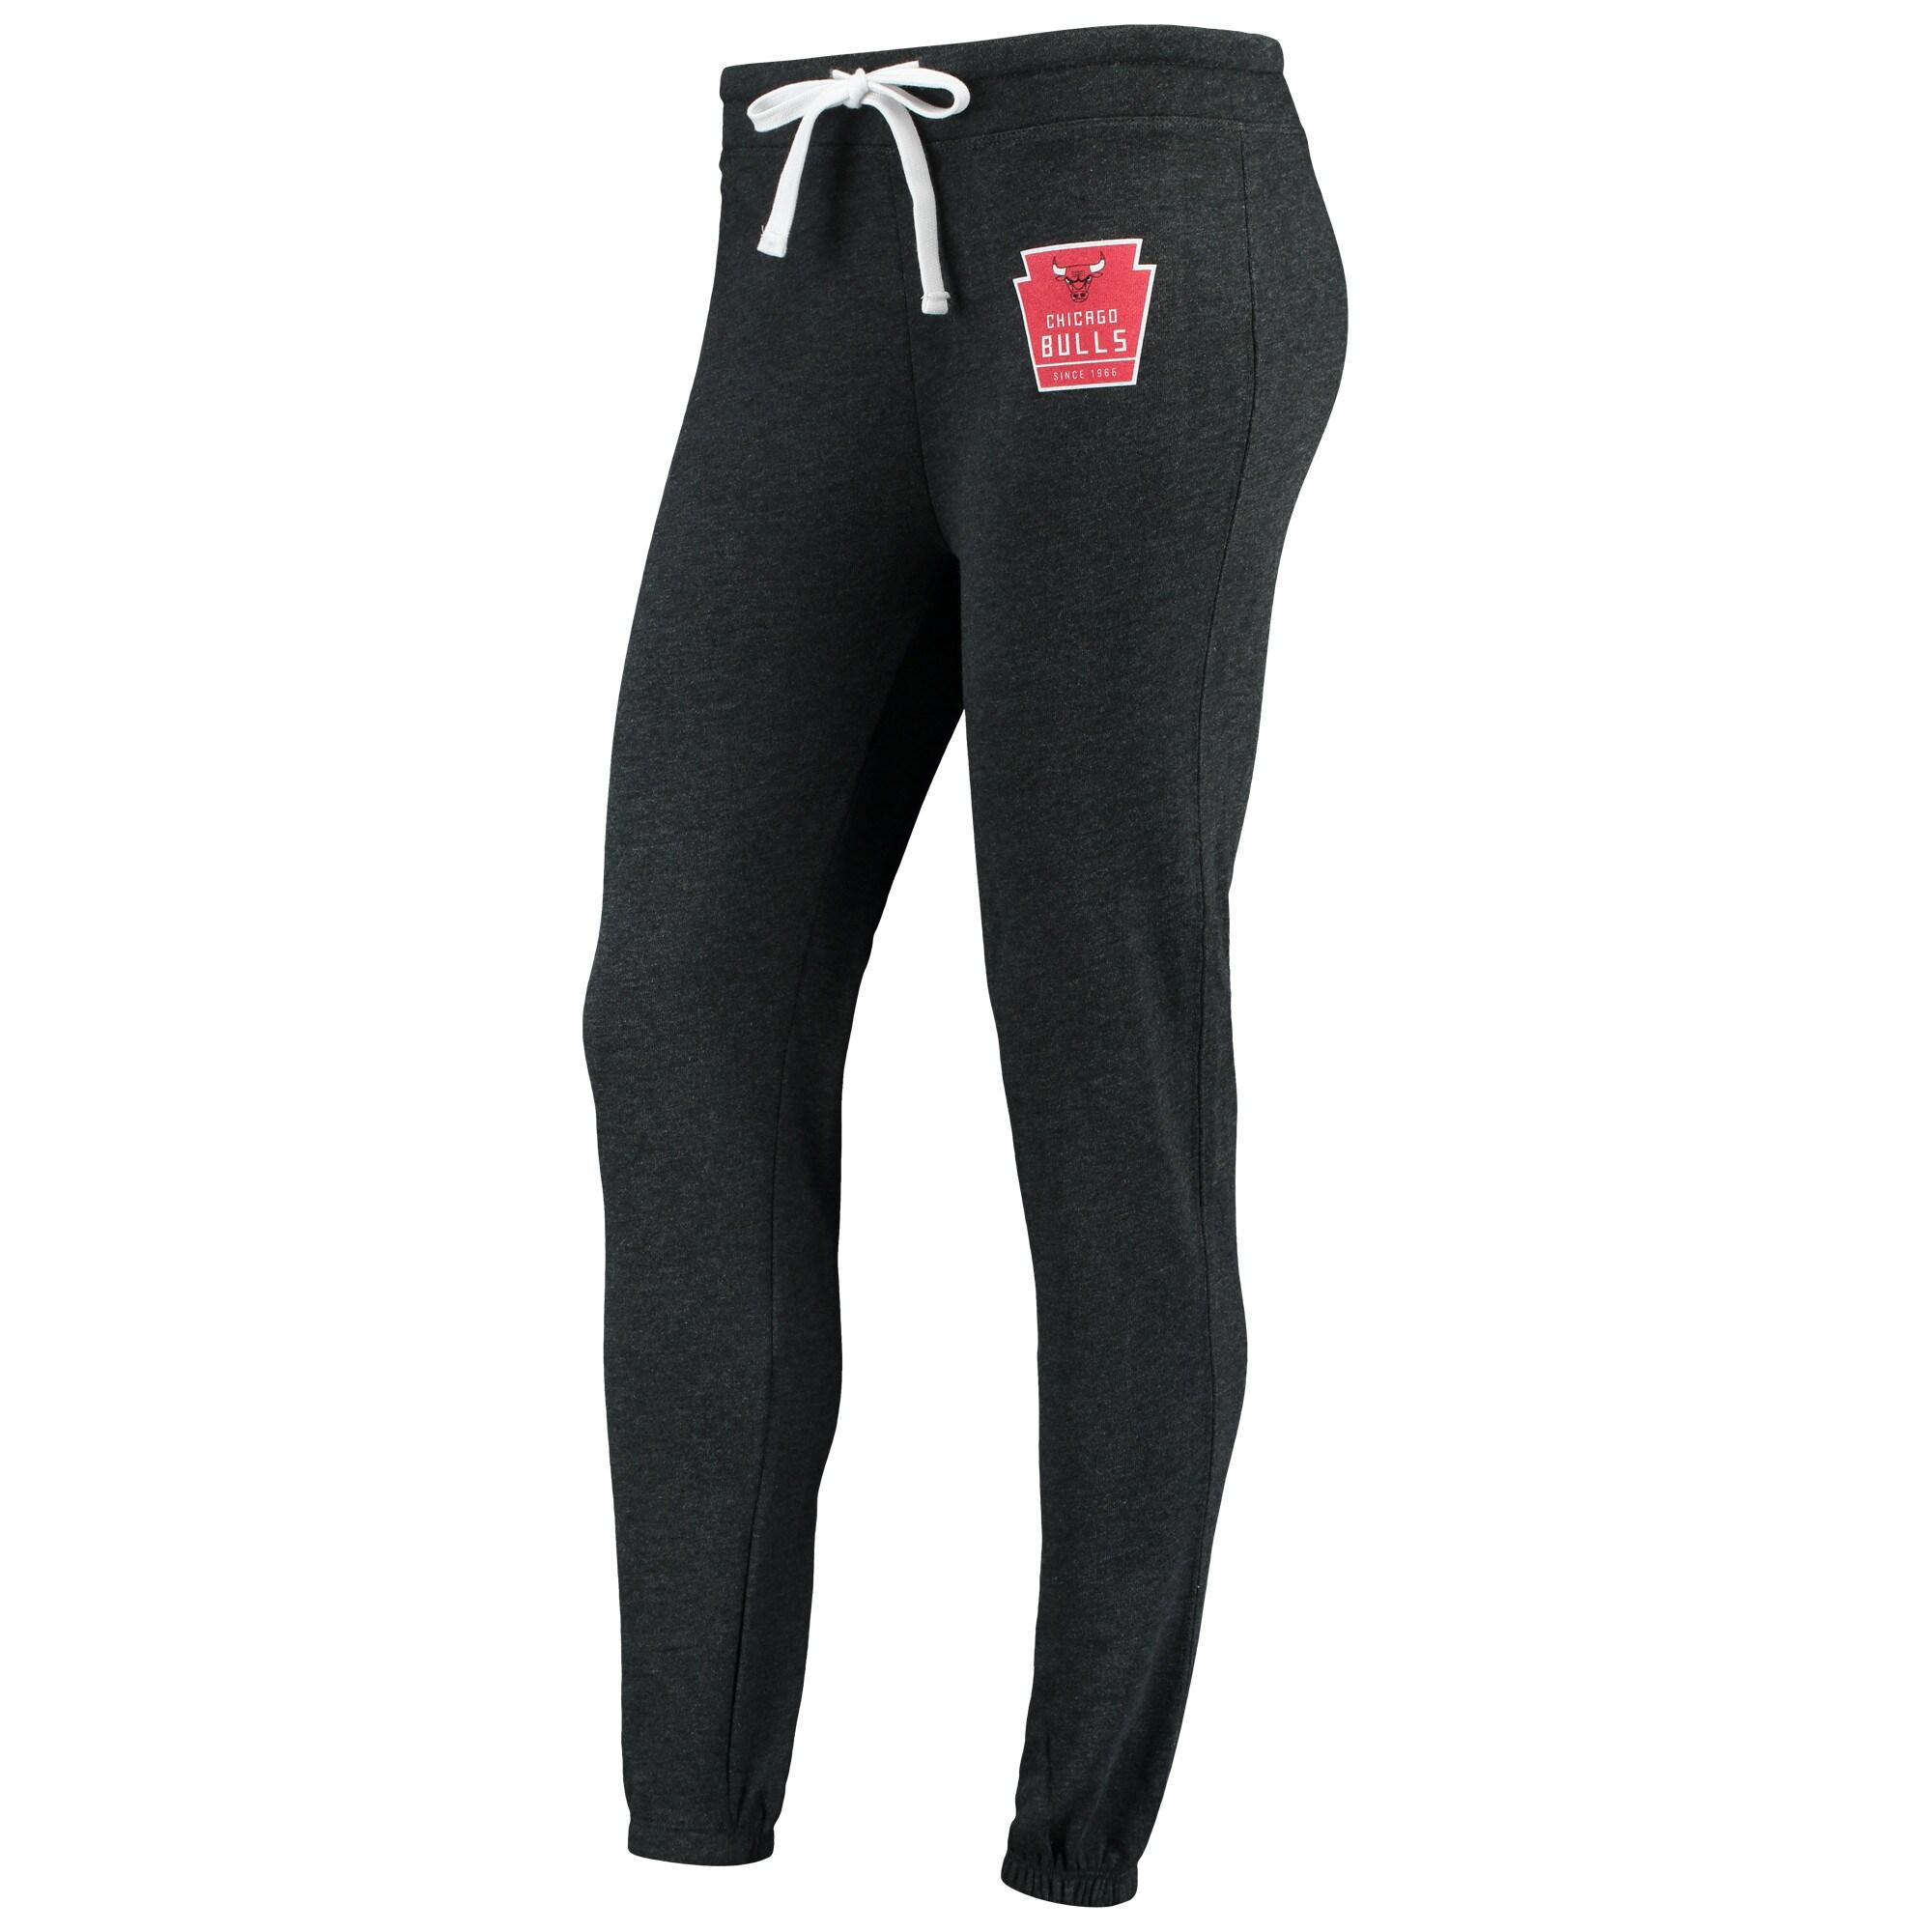 Chicago Bulls Sportiqe Women's Dundee Classic Sweatpants - Black